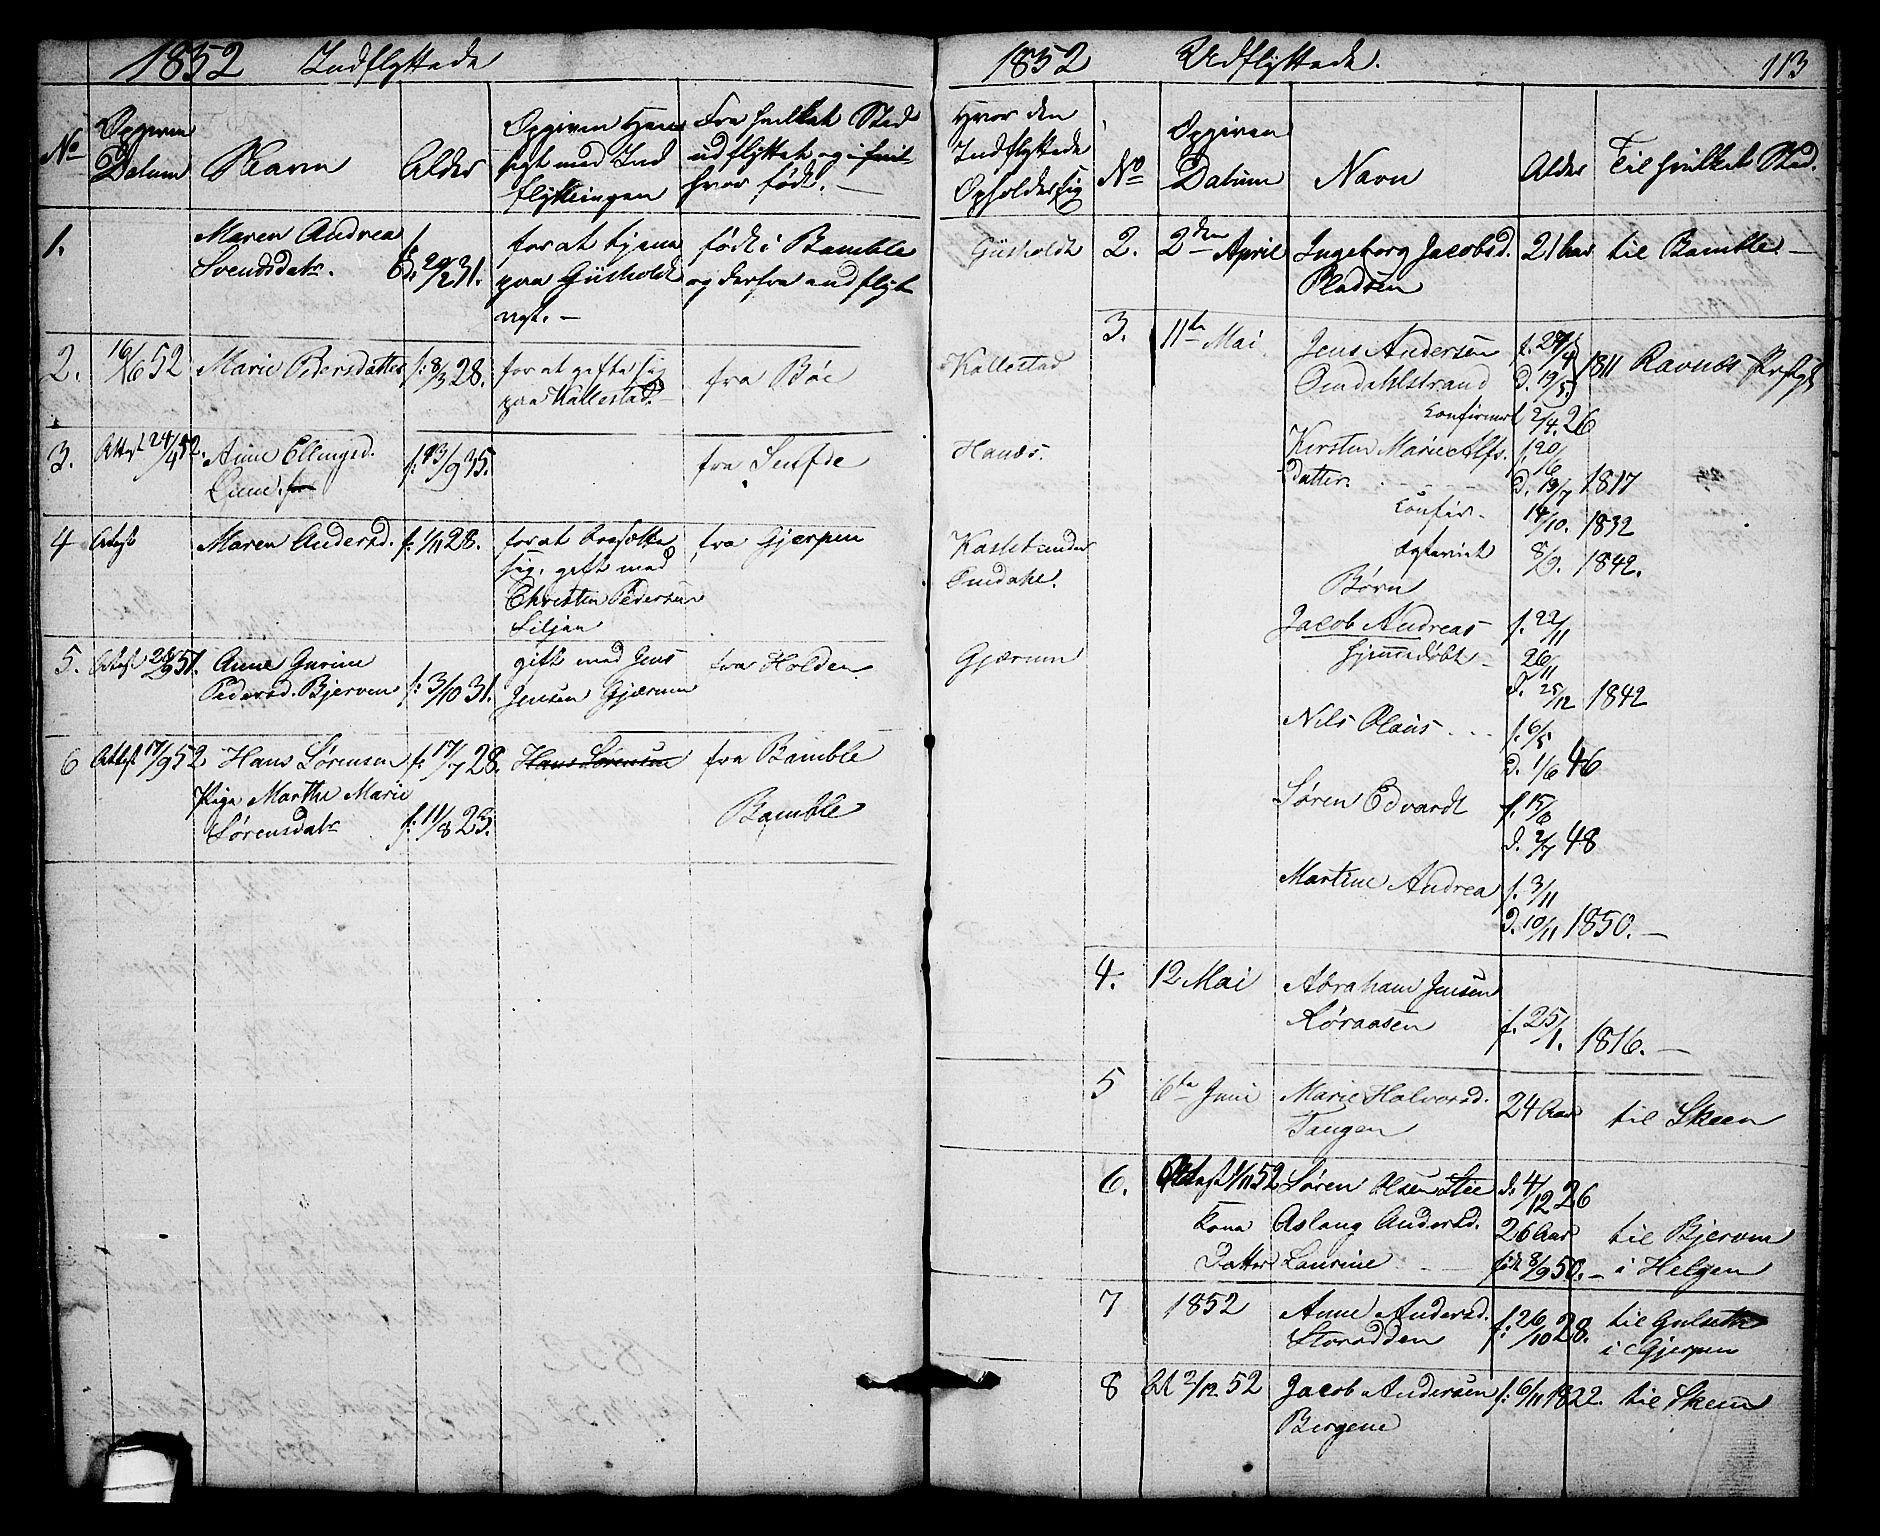 SAKO, Solum kirkebøker, G/Gb/L0001: Klokkerbok nr. II 1, 1848-1859, s. 113